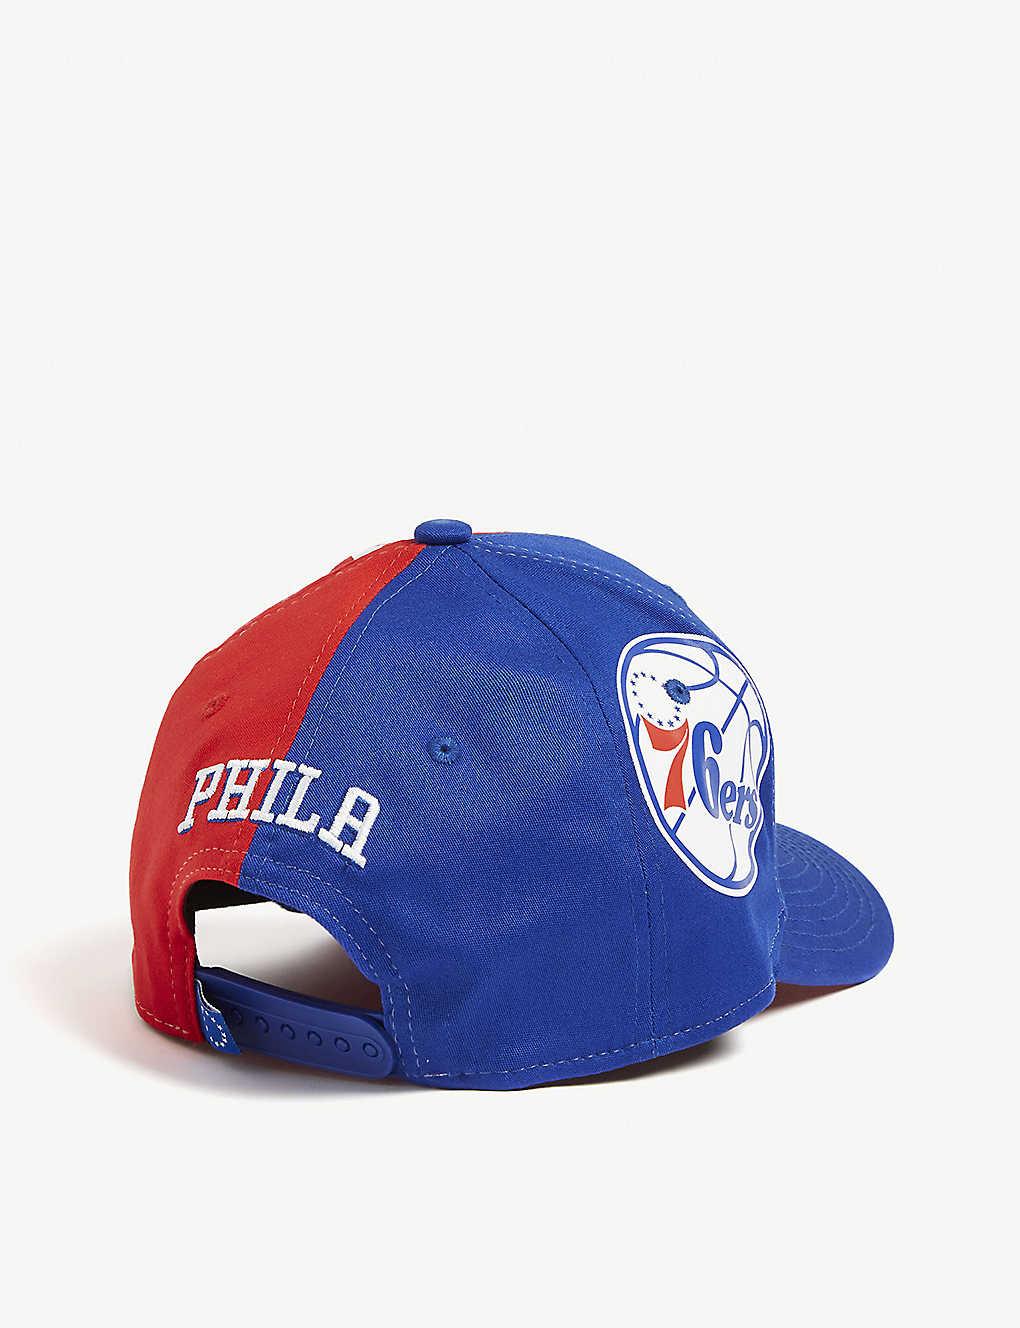 lowest price 46506 1515c ... Philadelphia 76ers 9Fifty cap - Blue red zoom